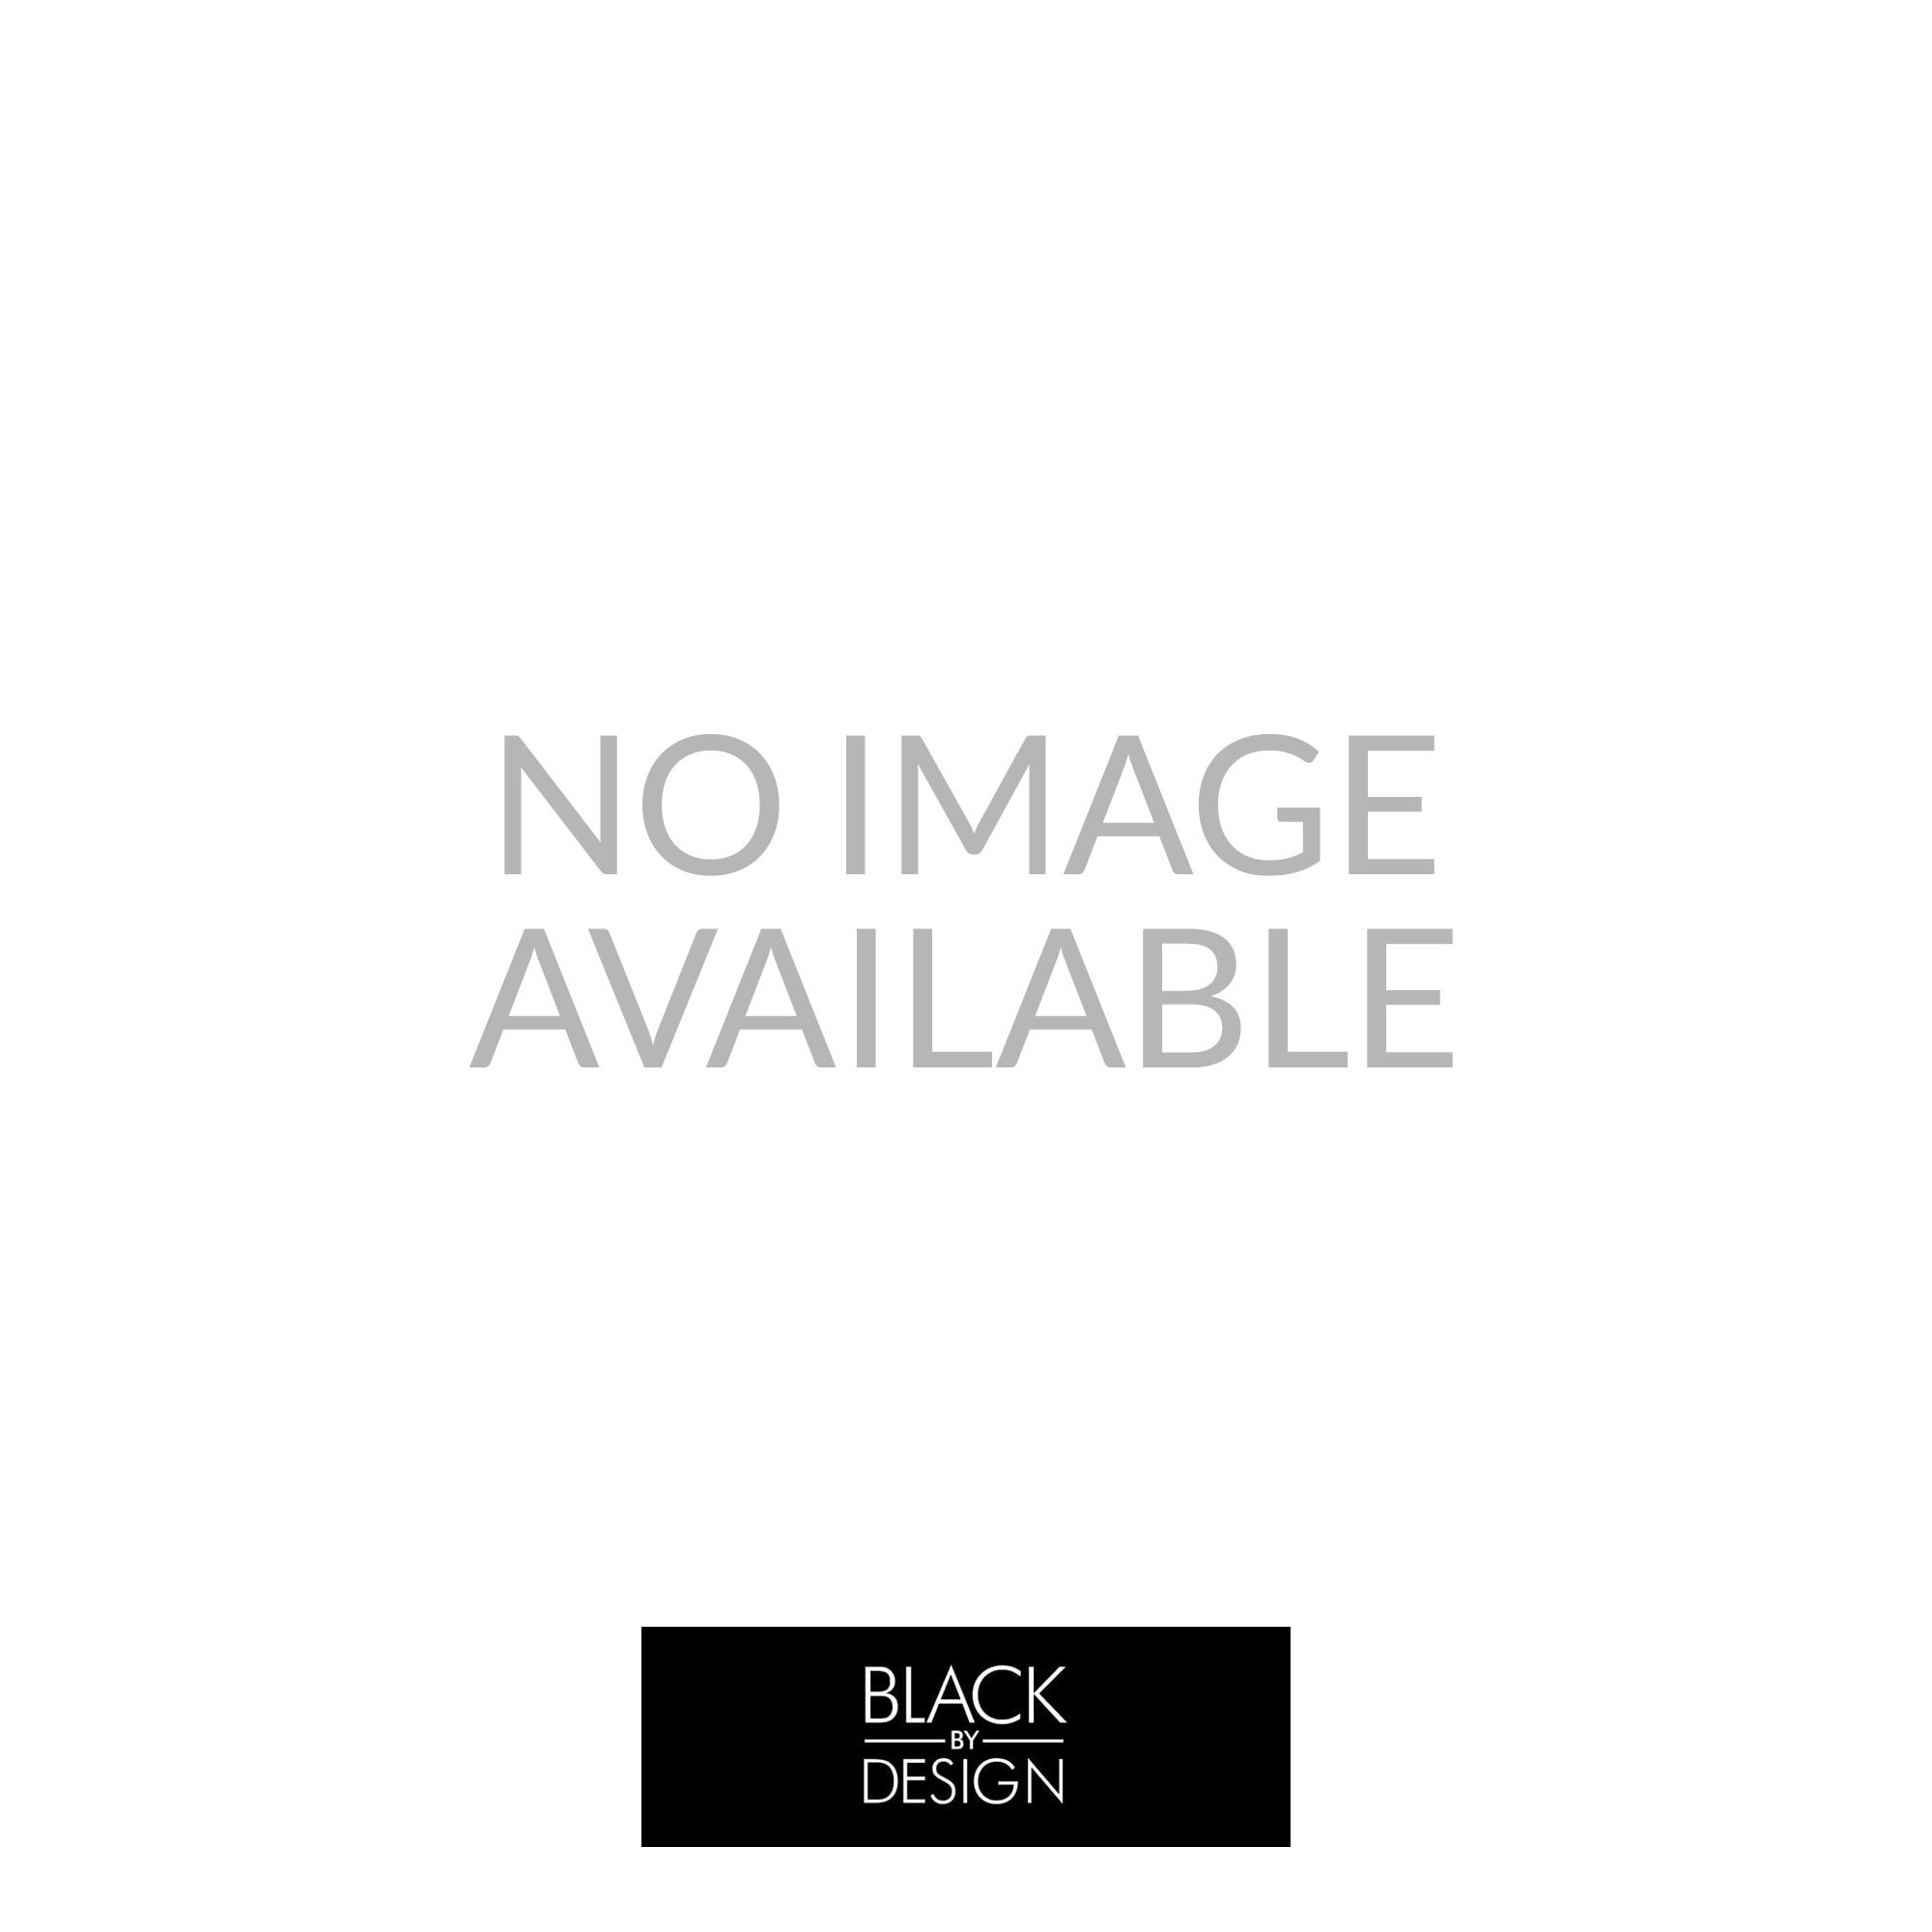 Vita aluvia lamp shade pearl medium black by design aluvia pendant light shade pearl medium mozeypictures Image collections